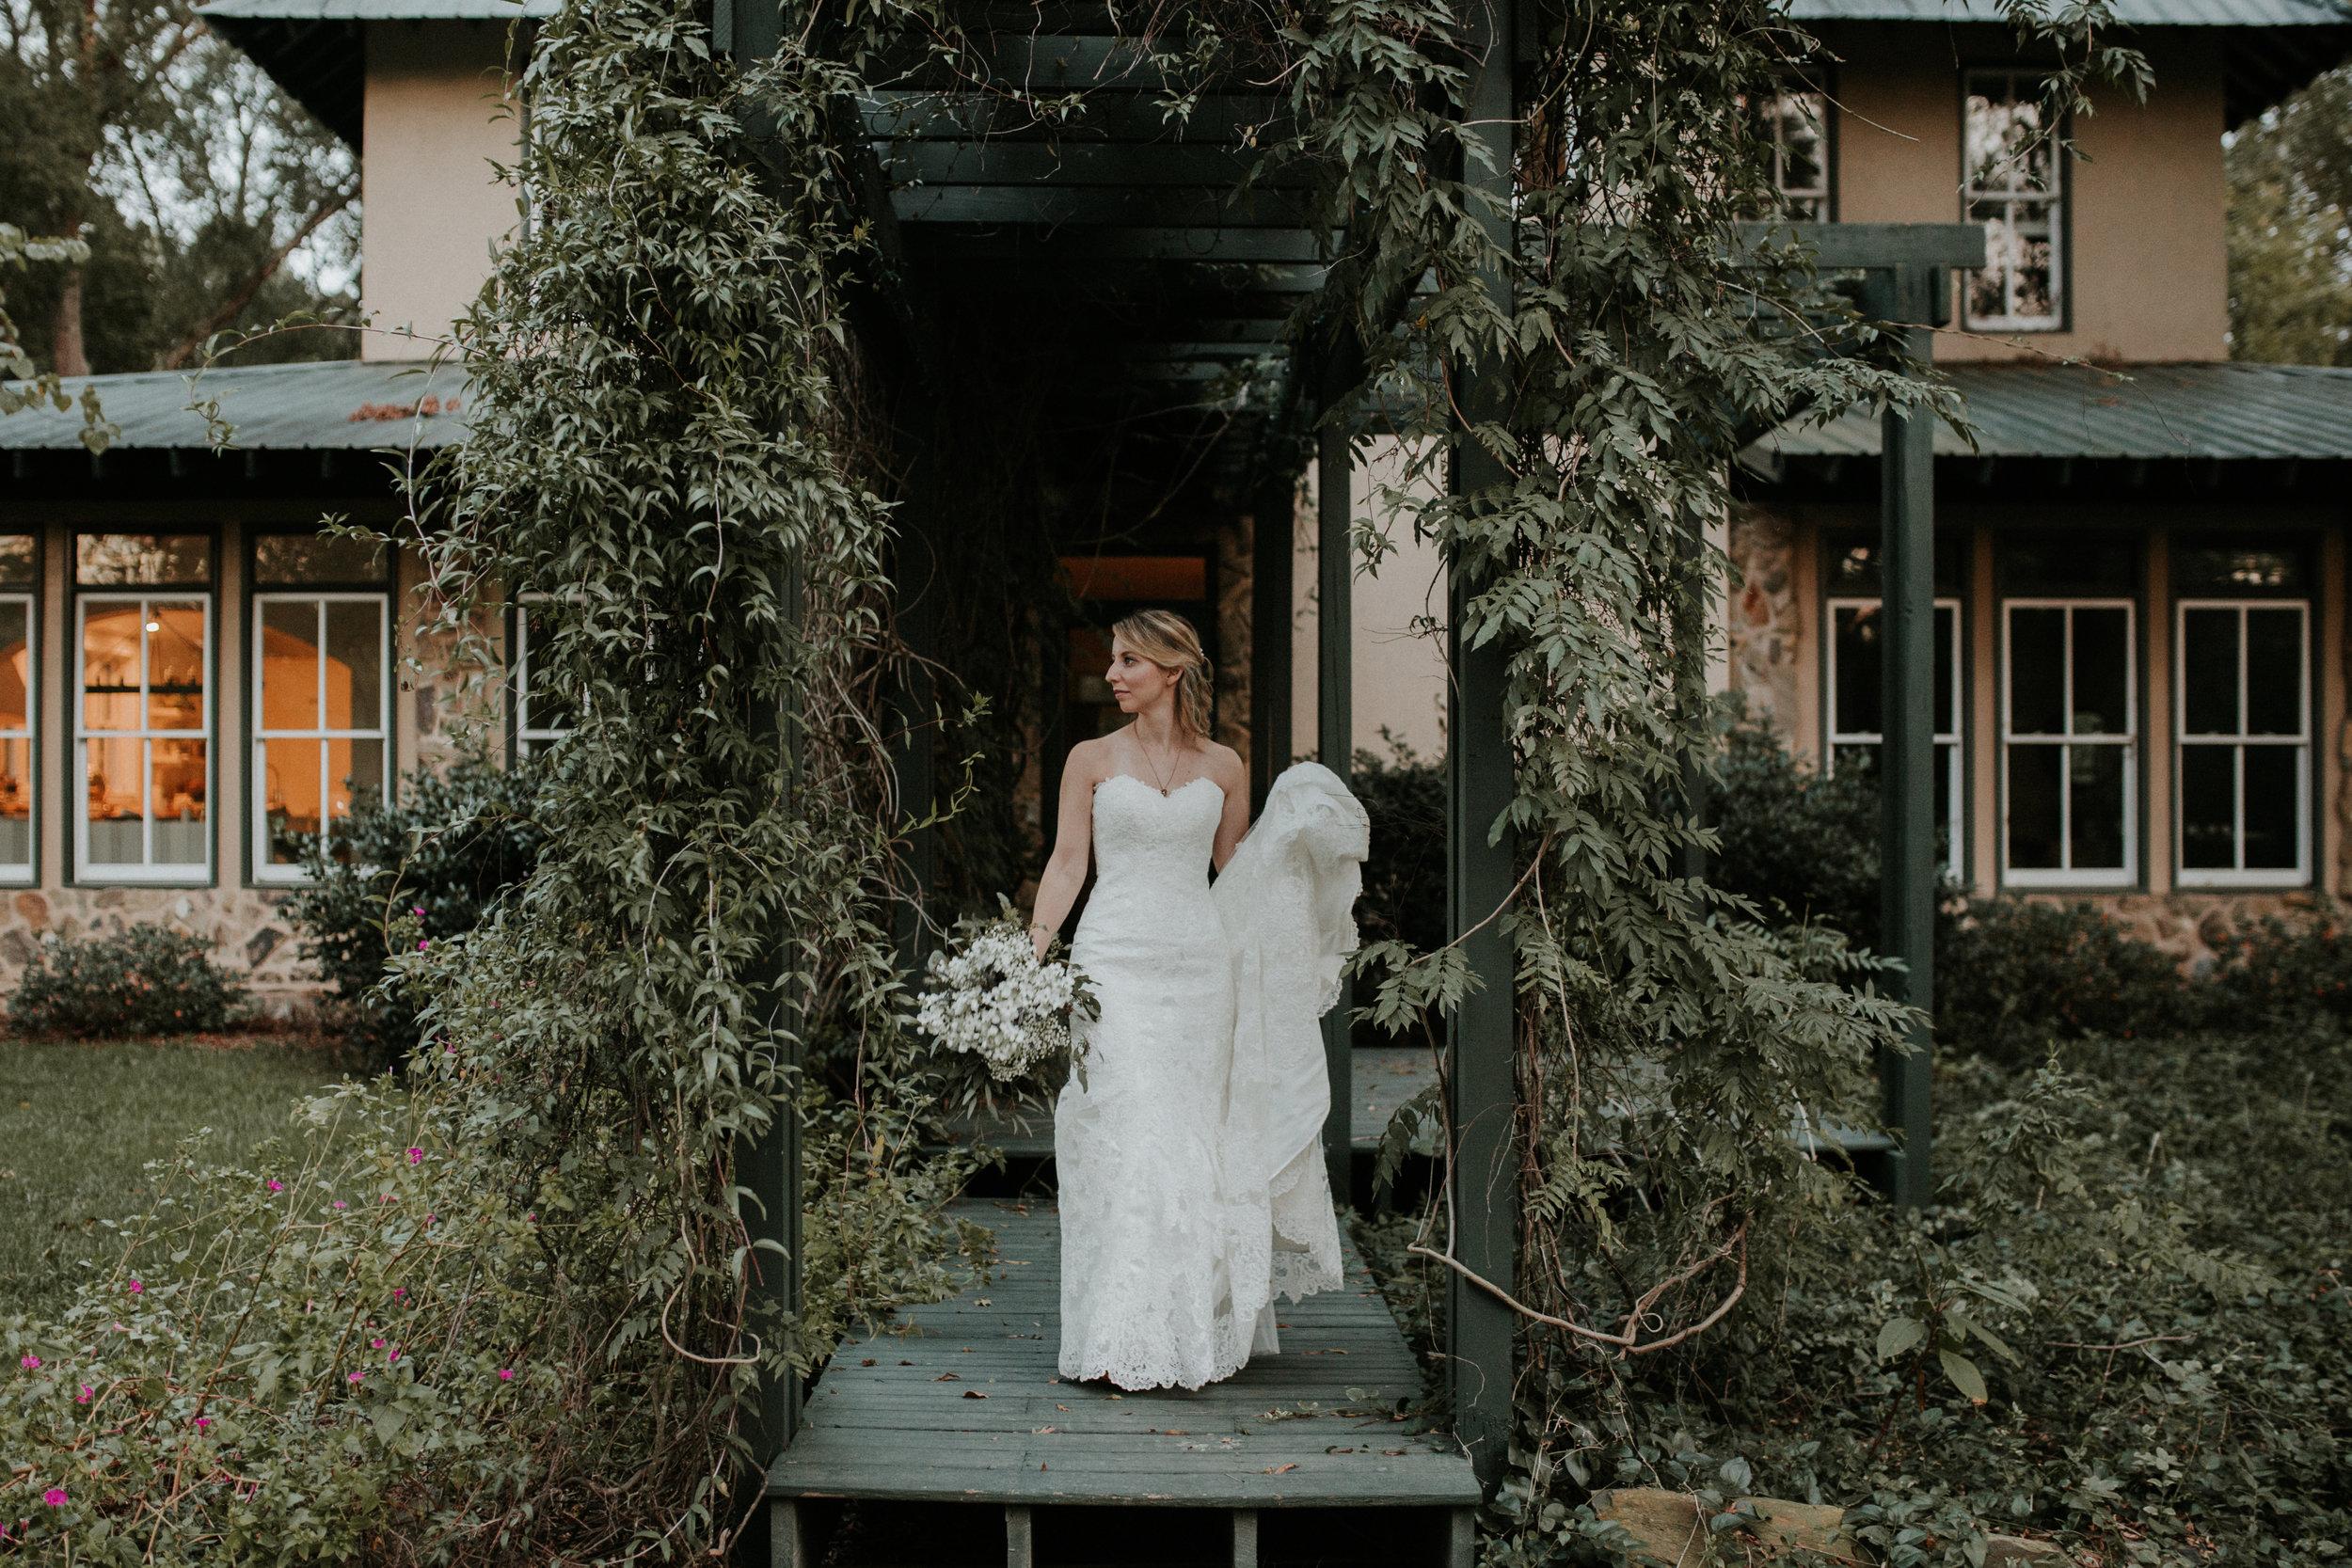 charlotte-wedding-photographer-daniel-stowe-2550.jpg